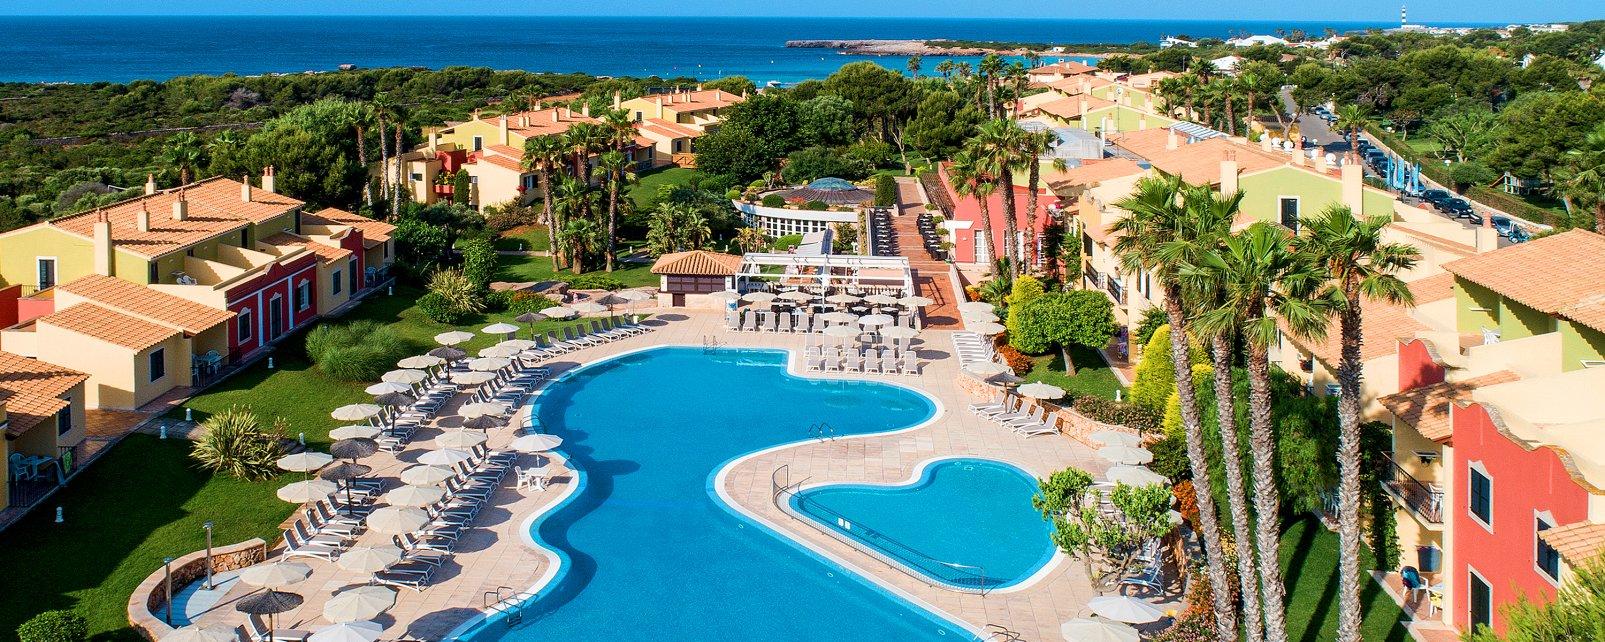 Hôtel Grupotel Playa Club